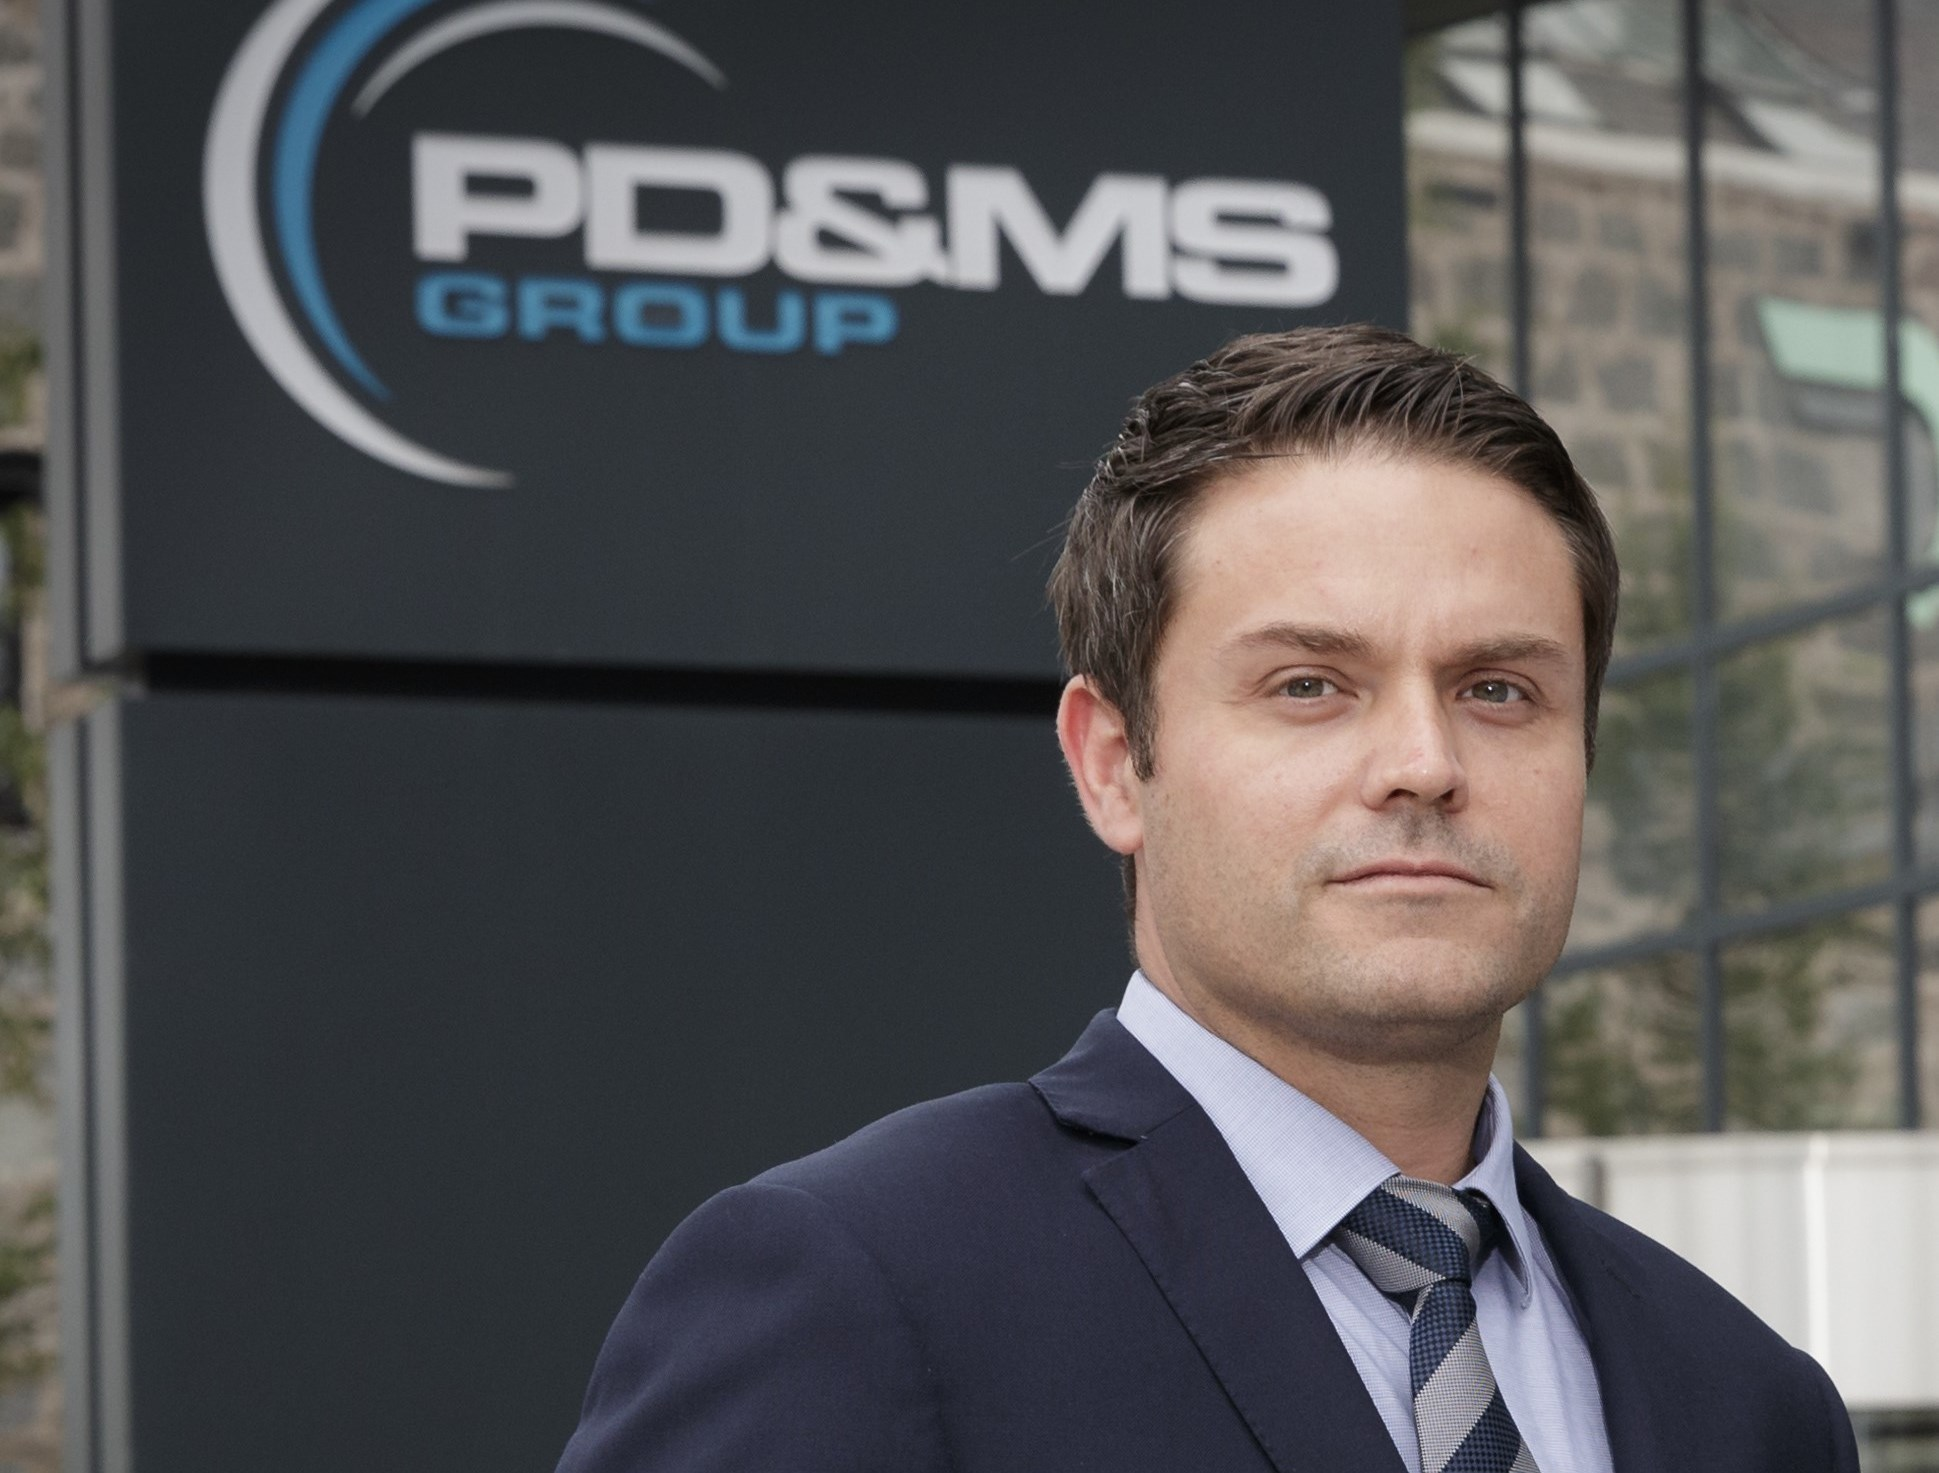 Simon Rio, PD&MS Group chief executive.